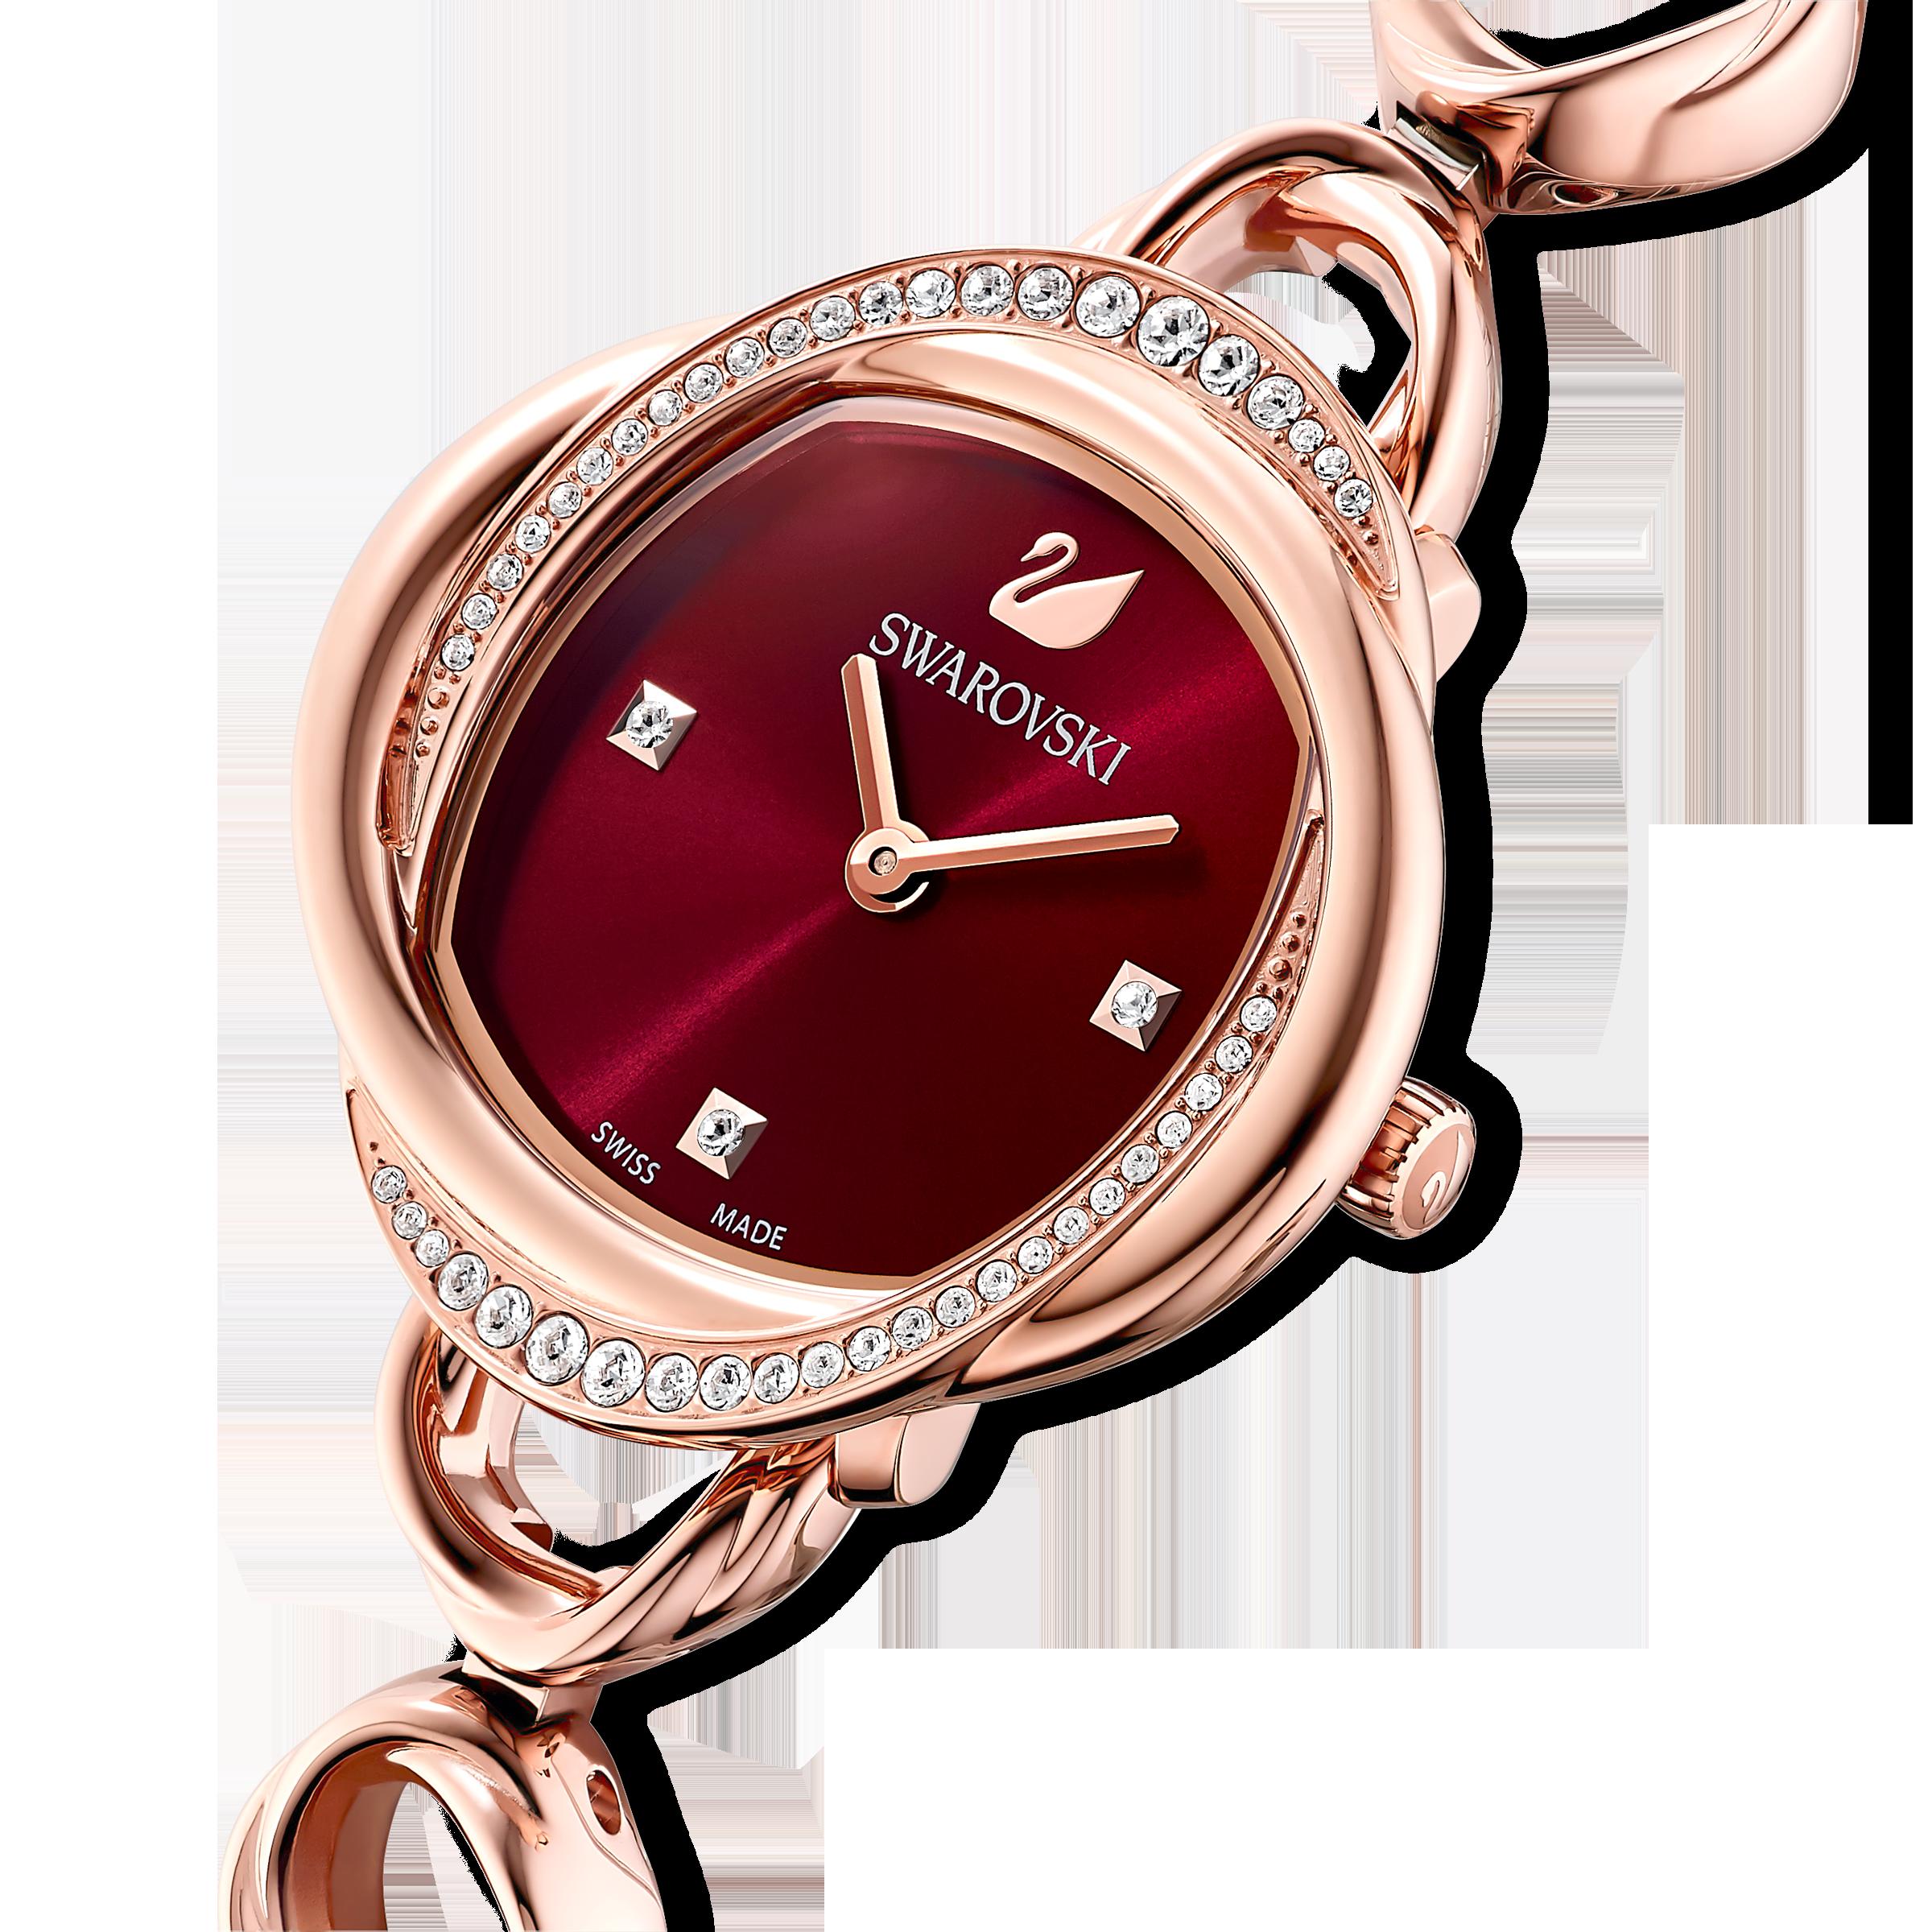 Crystal Flower Watch, Metal bracelet, Red, Rose-gold tone PVD